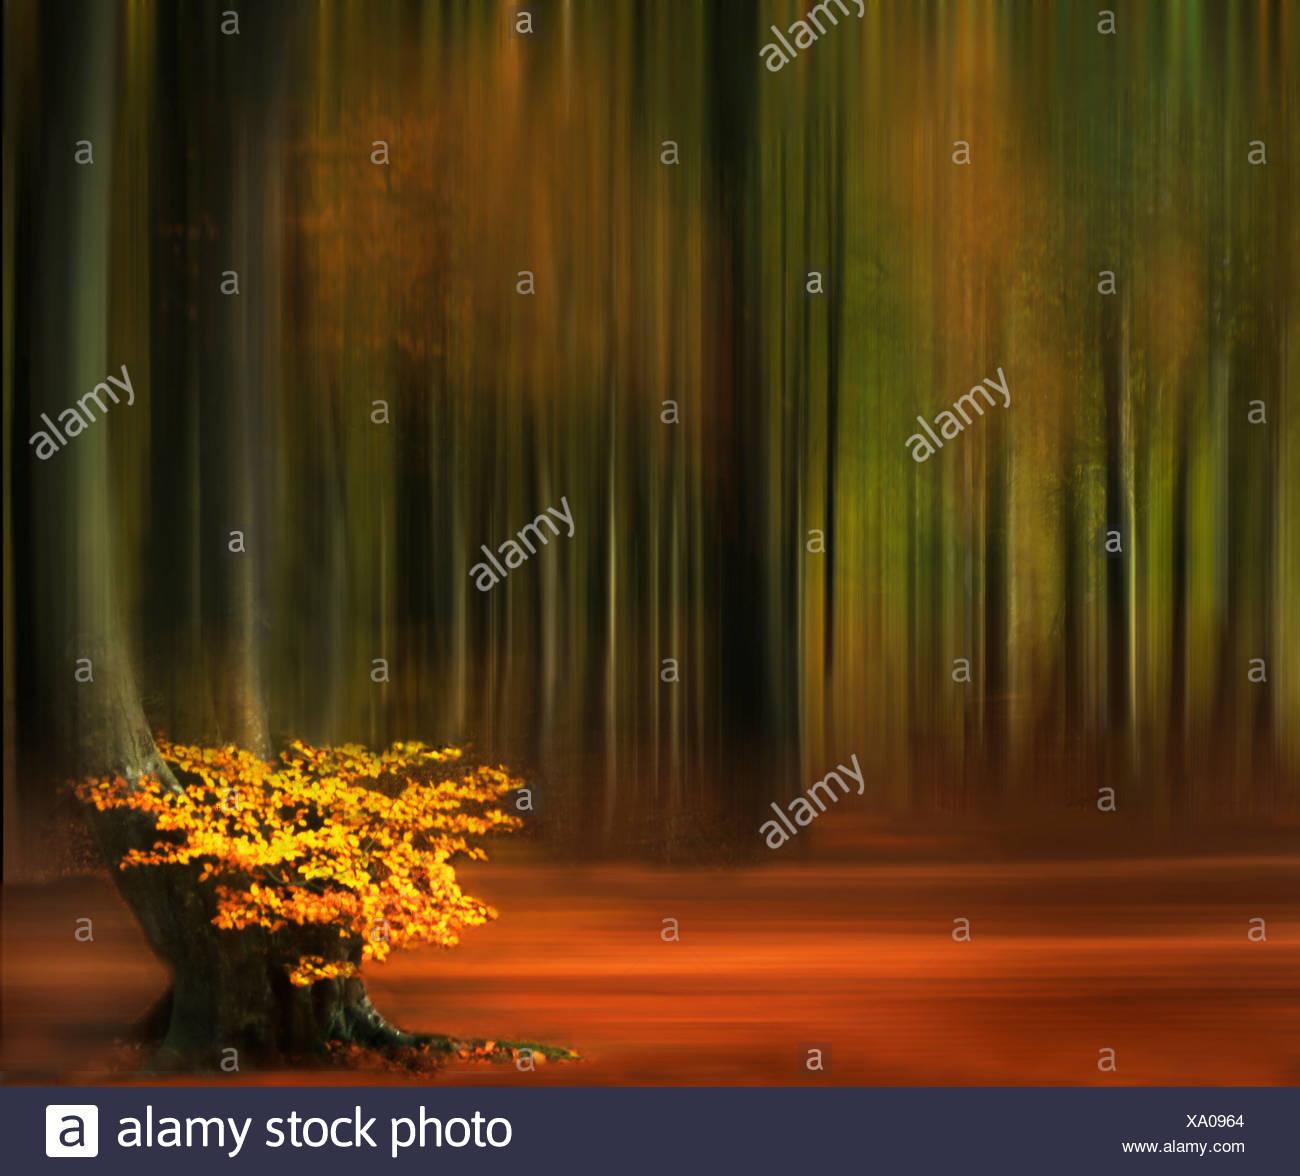 Beechwood in Autumn - Stock Image